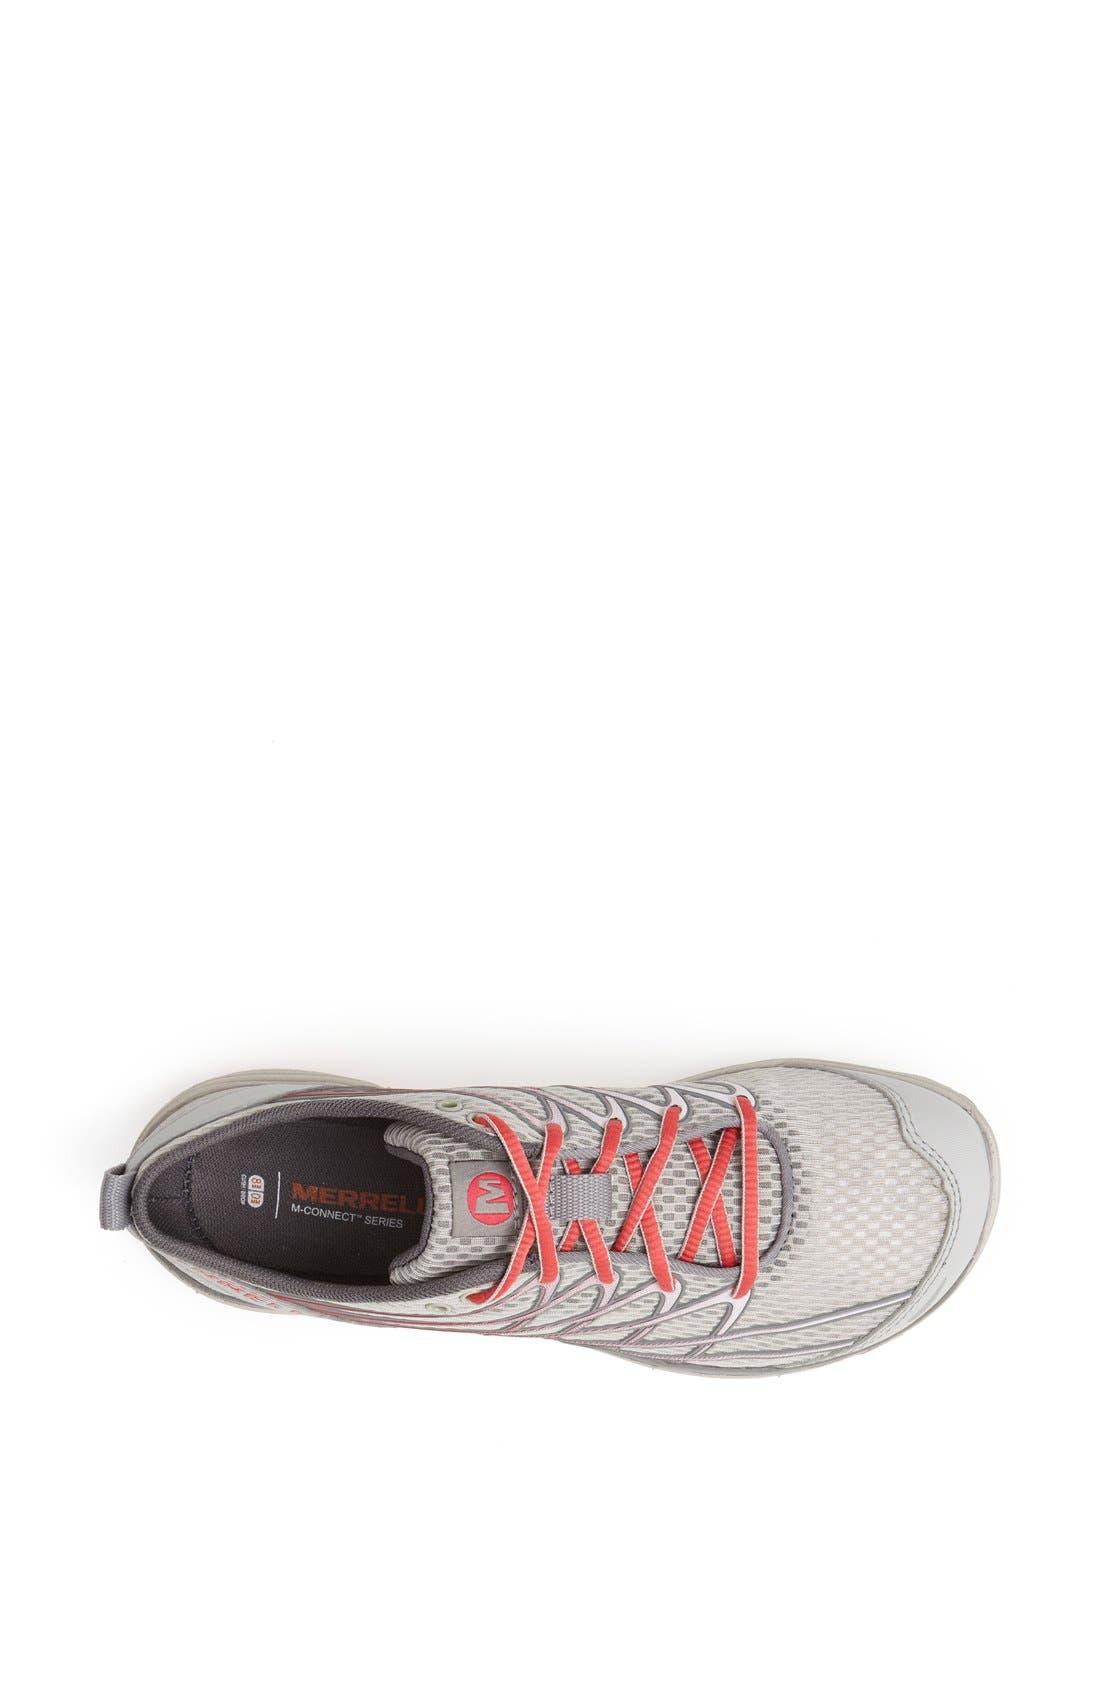 Alternate Image 3  - Merrell 'Bare Access Arc 3' Running Shoe (Women)